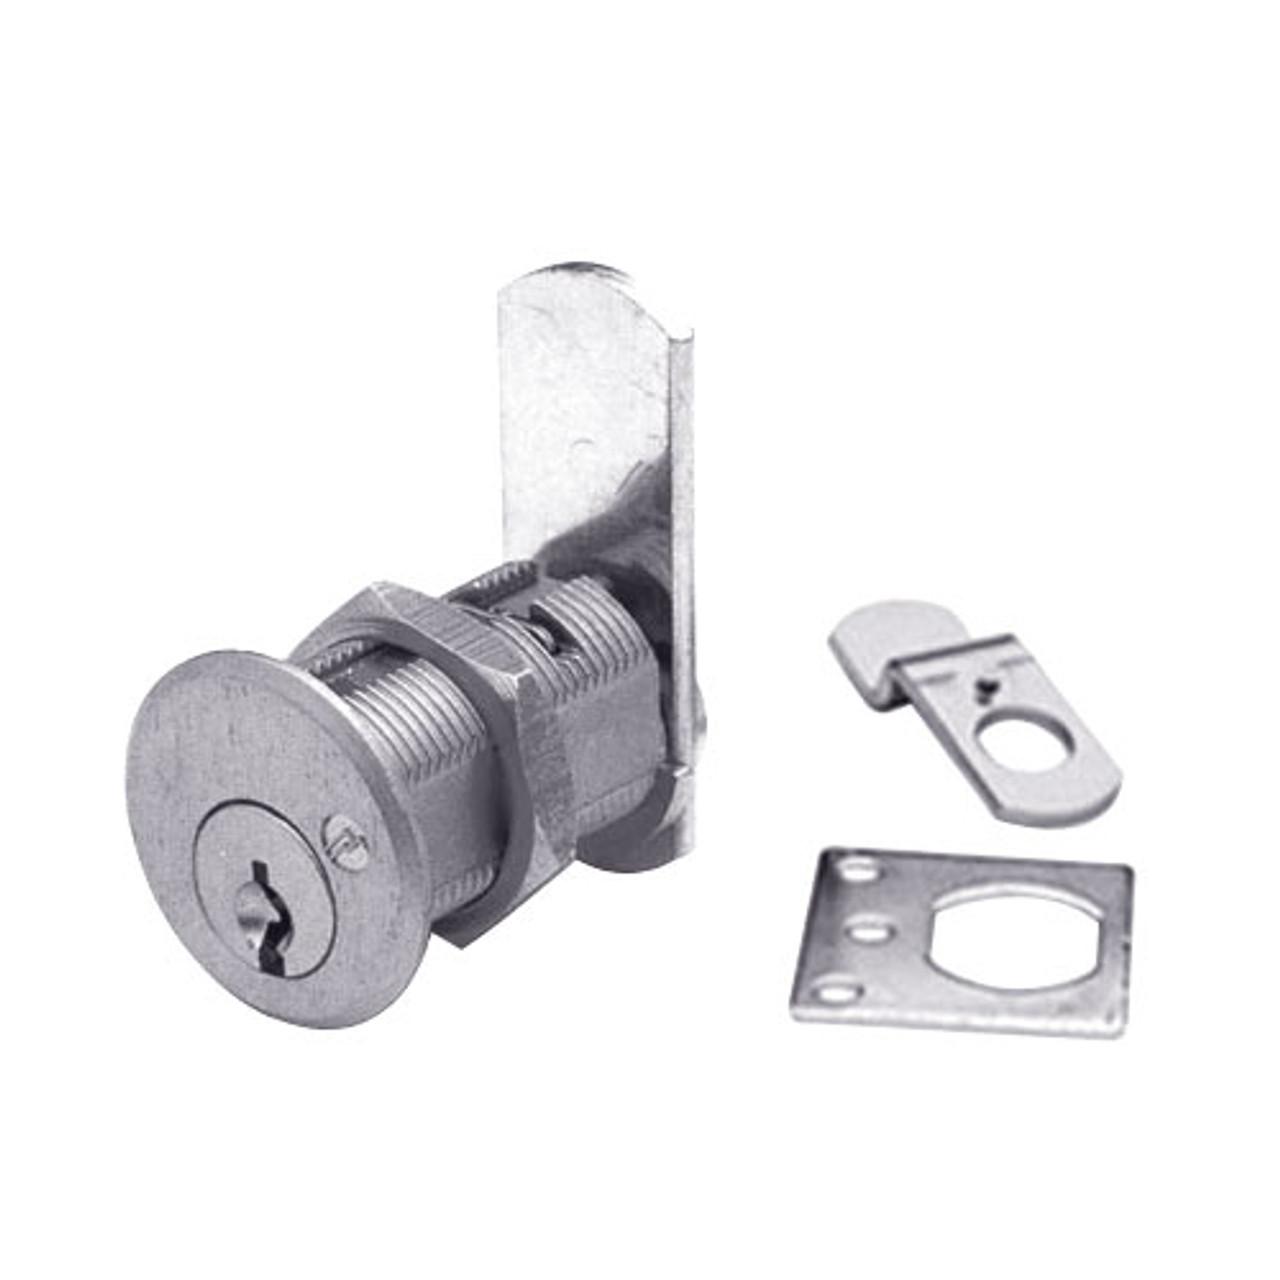 Olympus DCN1-MK-26D Cam Locks in Satin Chrome Finish